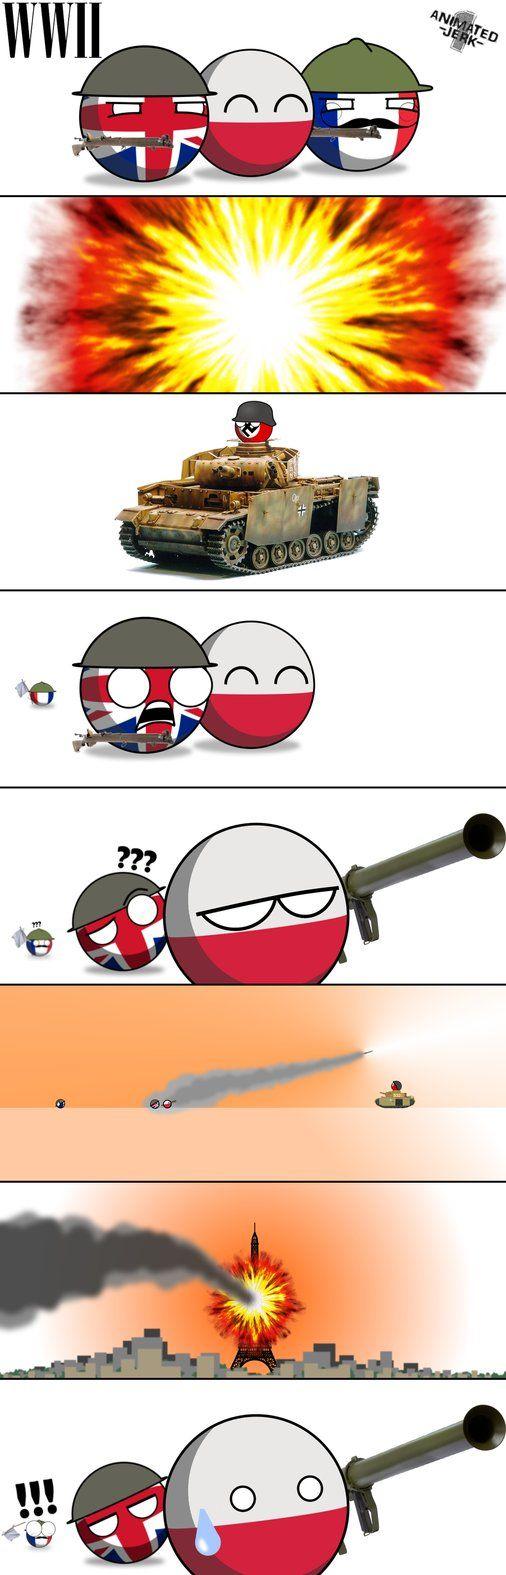 Countryballs 'Polandball': WWII by animatedjerk